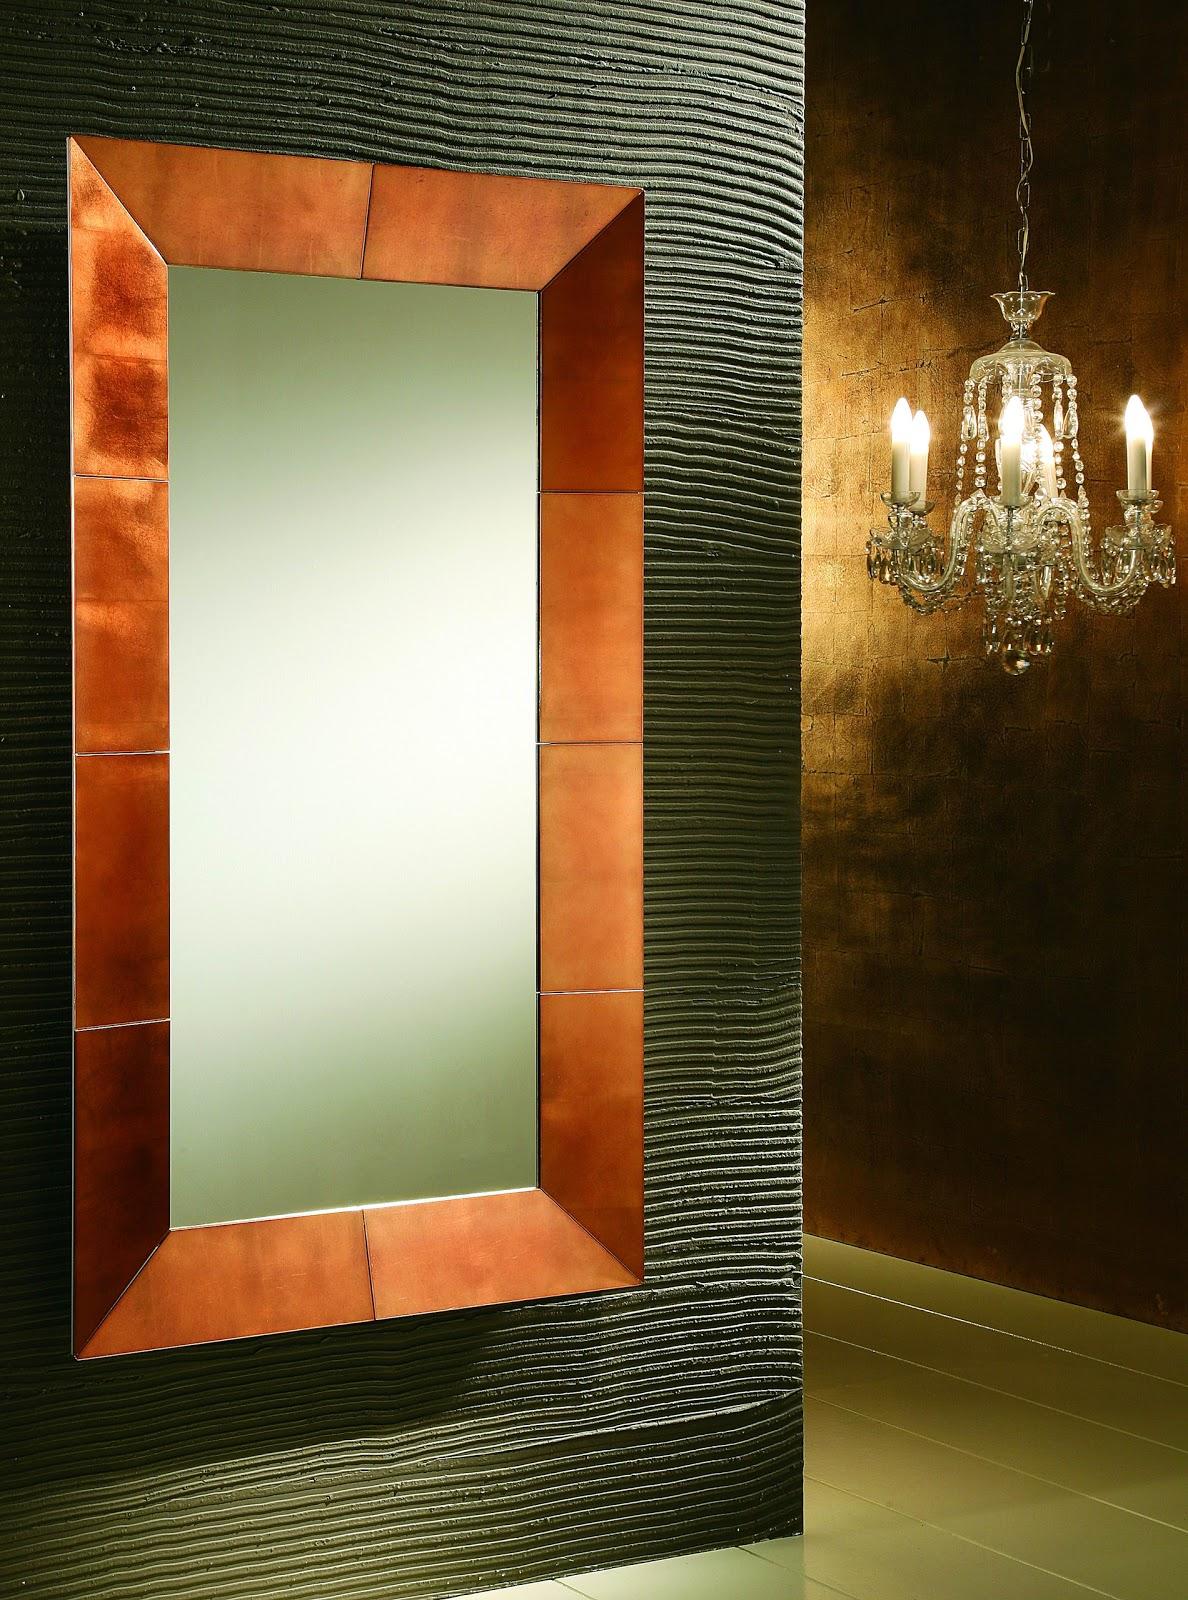 Decorative Mirrors India: Decorative Mirrors India